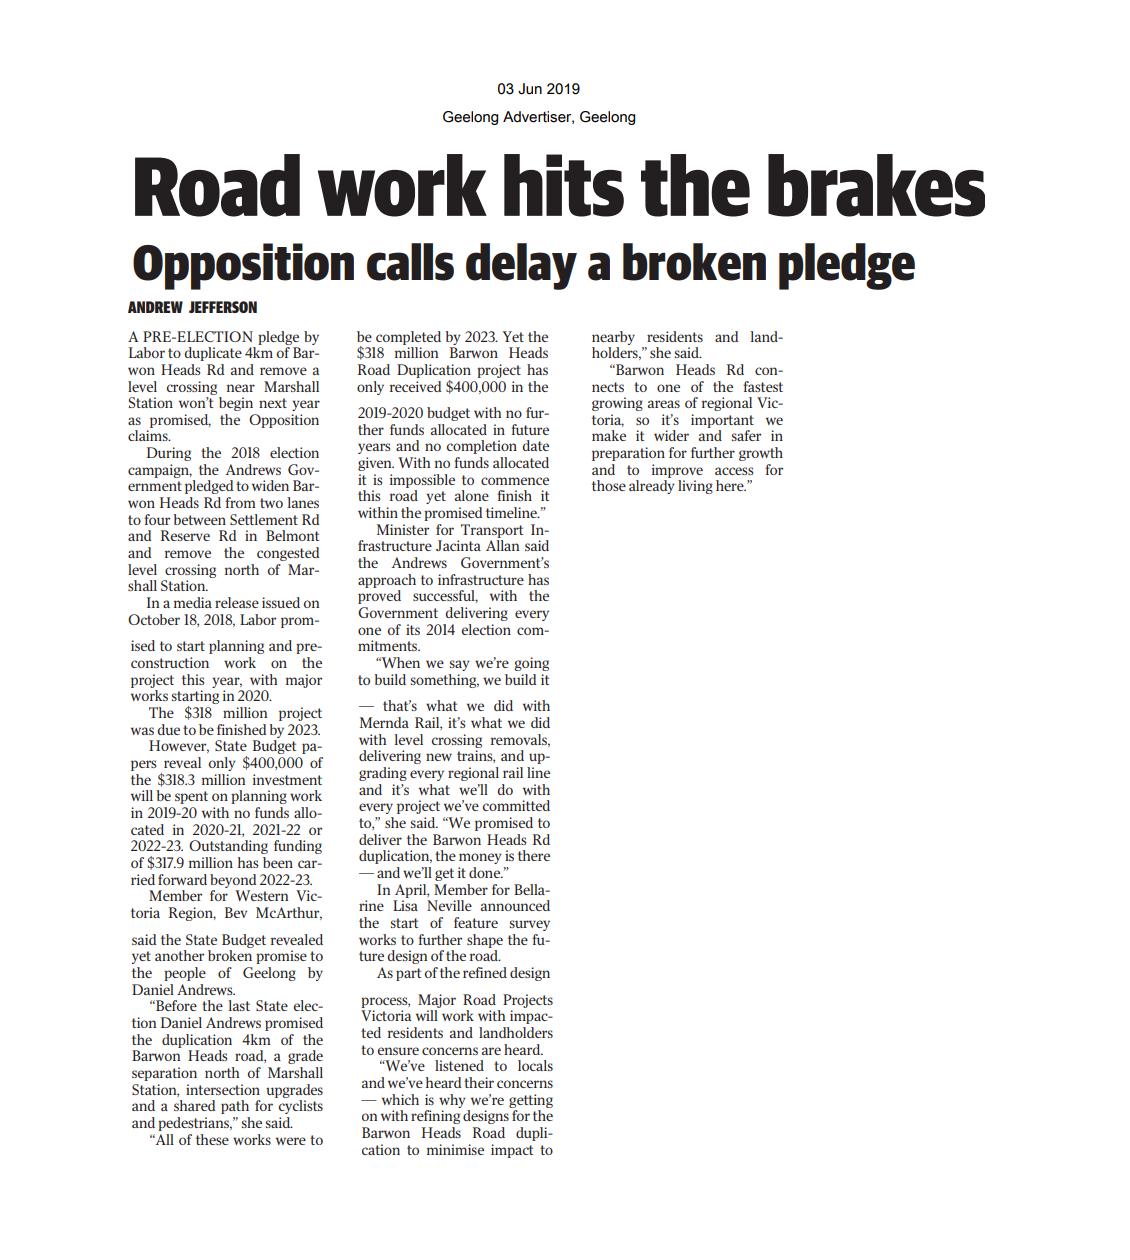 03062019 Road work hits the brakes - Geelong Advertiser.png